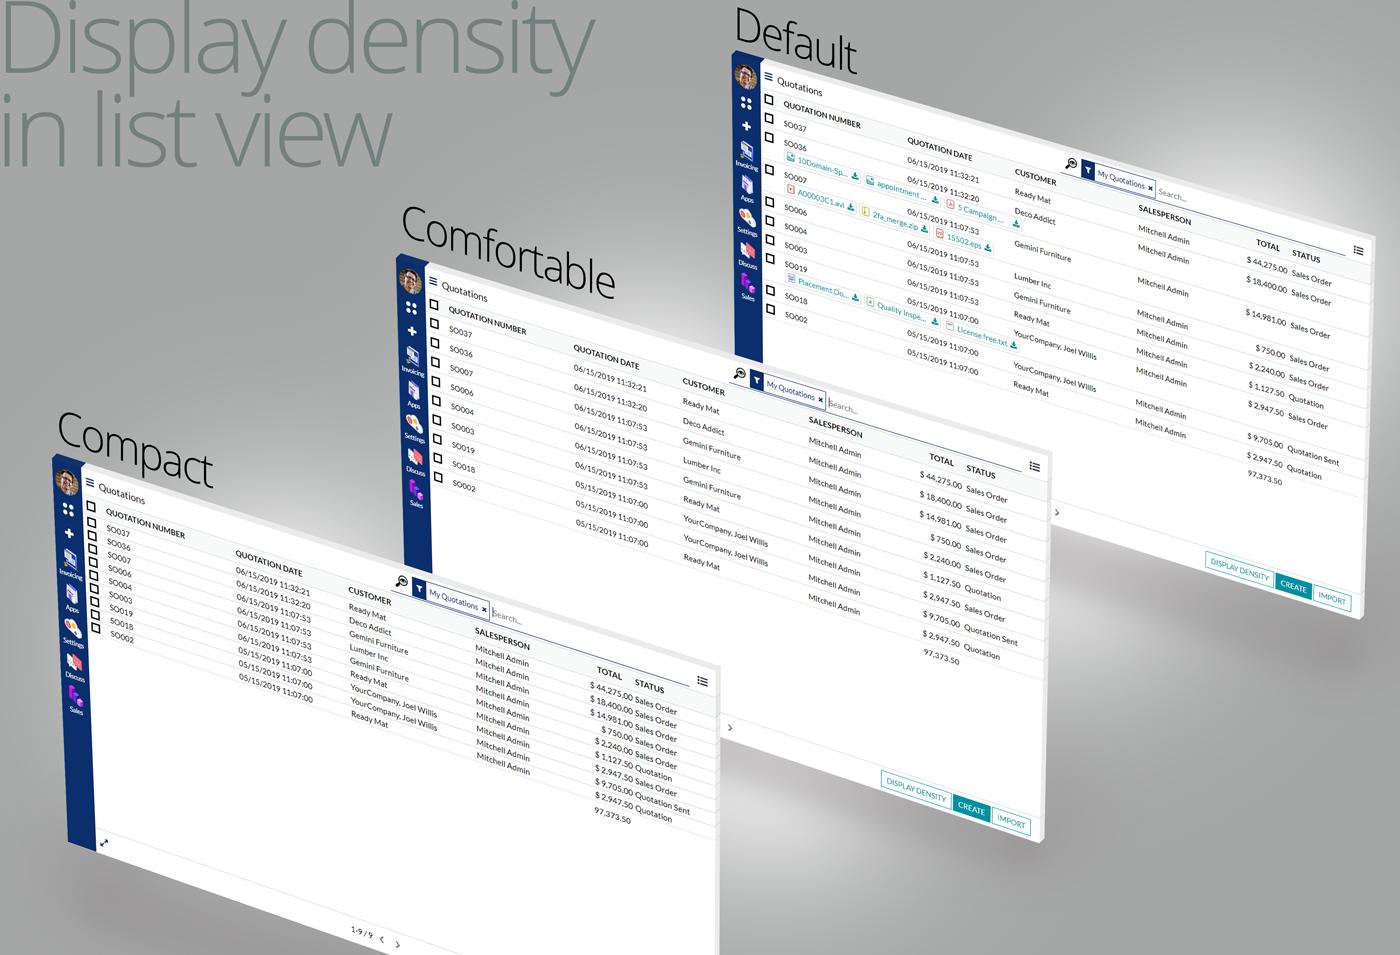 007_synconics_odoo_allure_backend_theme_display_density